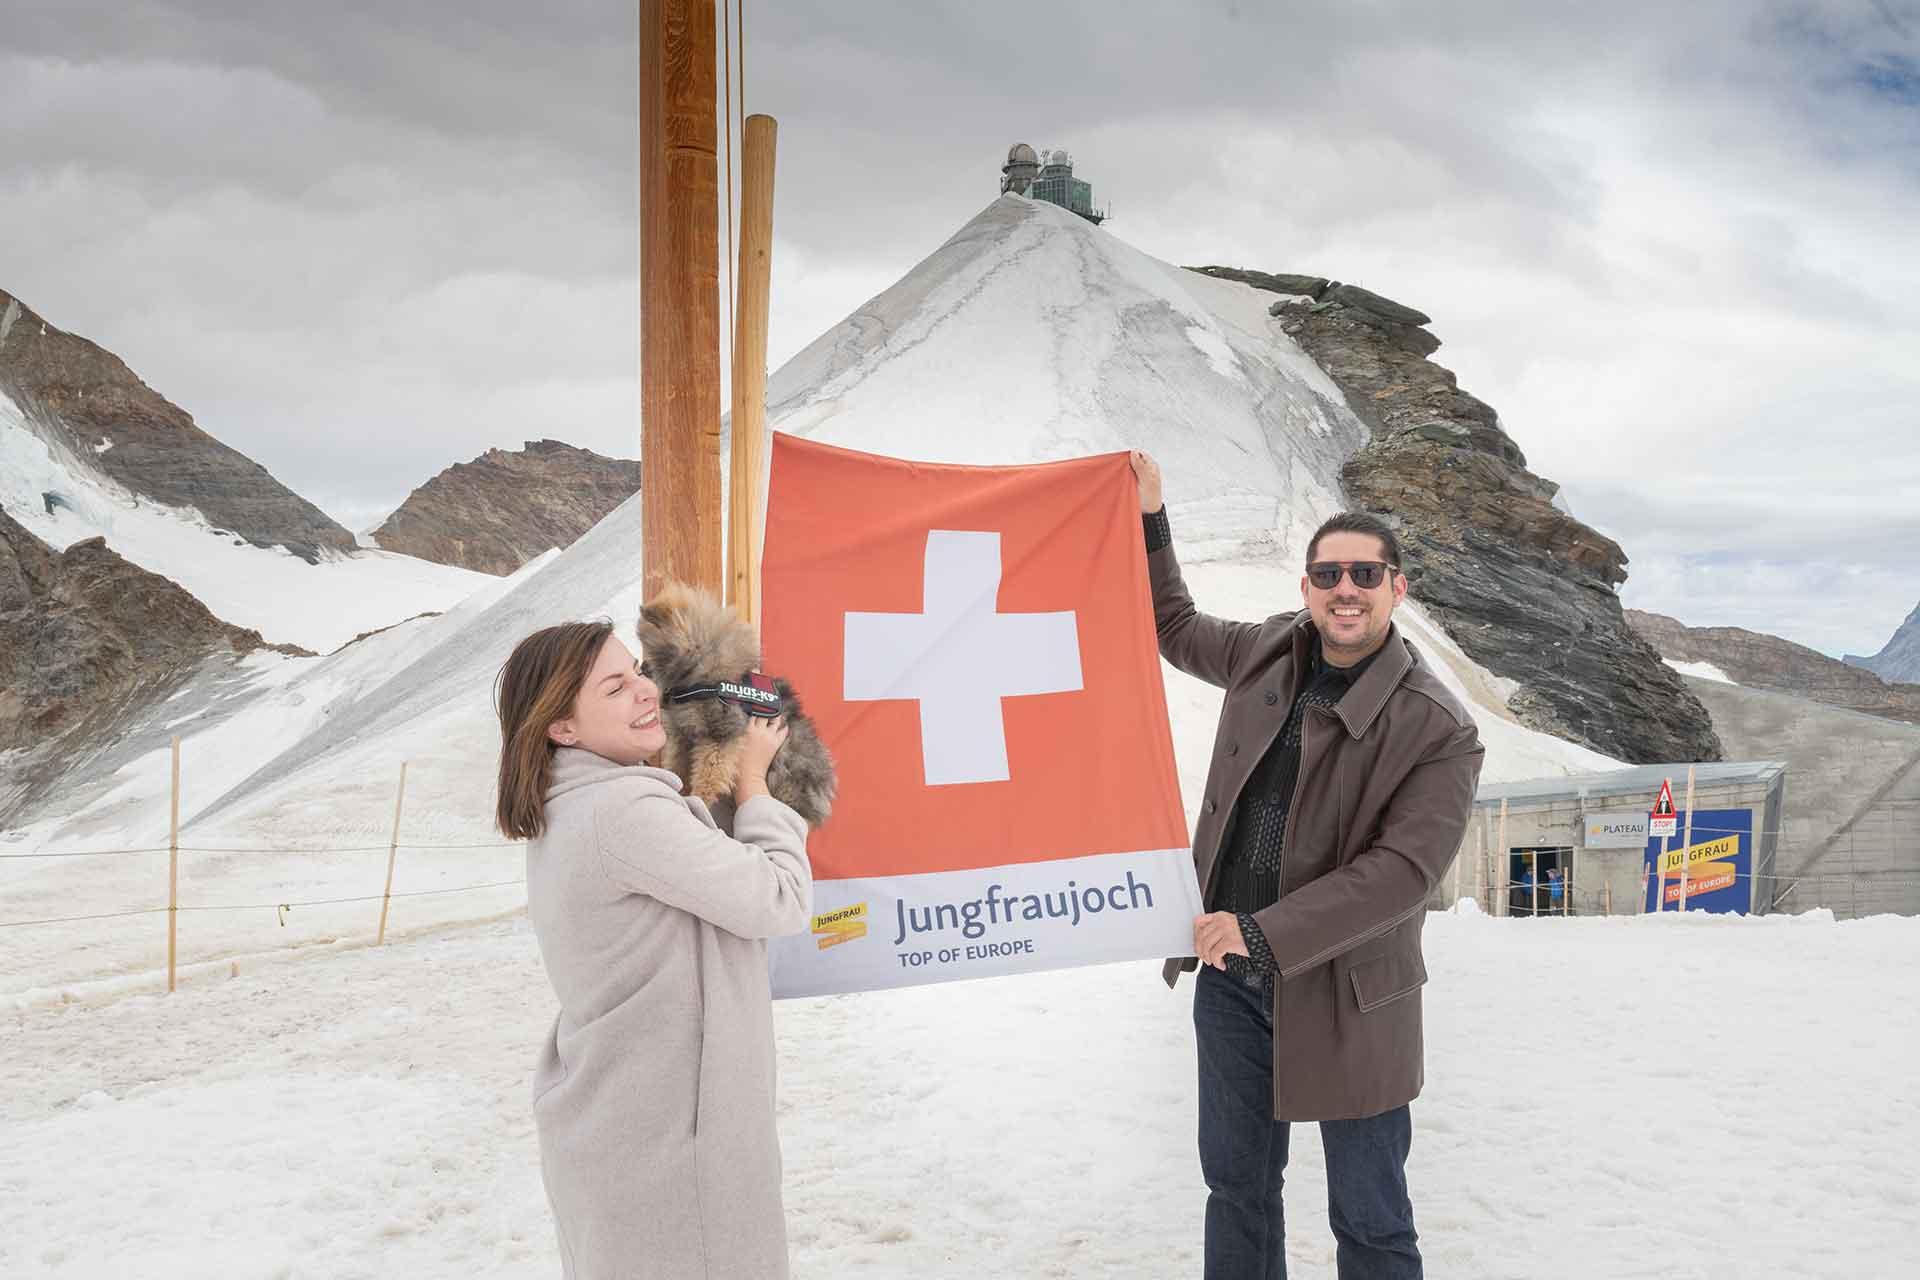 Photographer Jungfraujoch, Grindelwald and Wengen